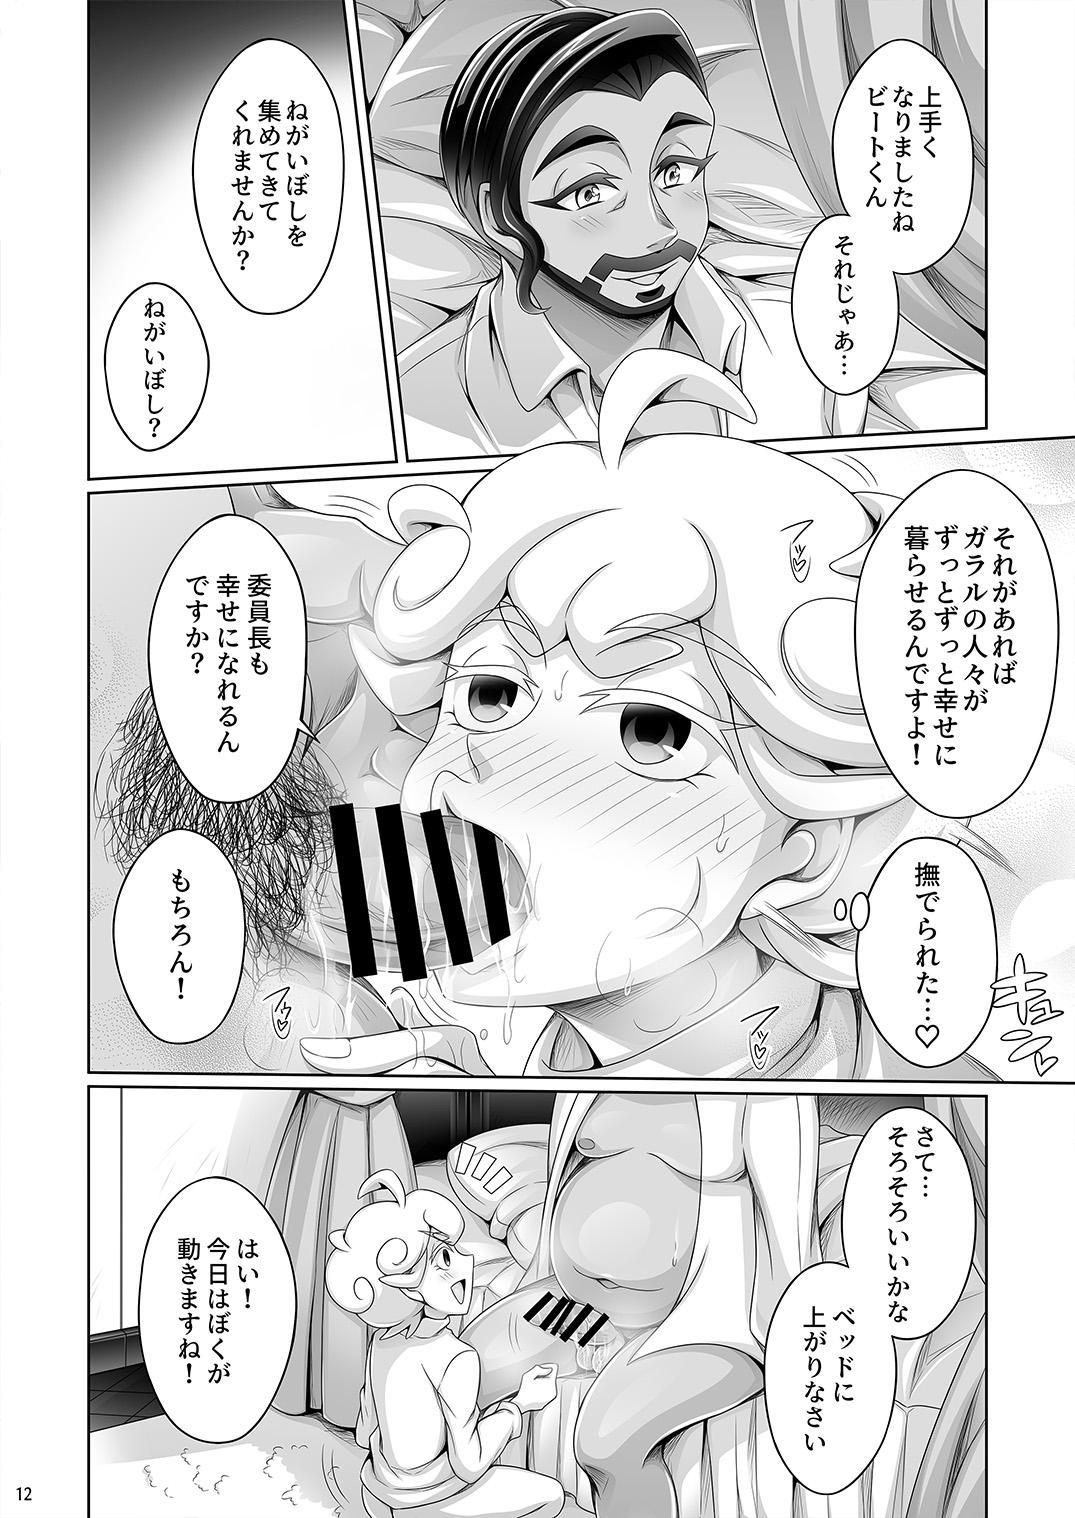 Shounen Beet no Kenshin 11